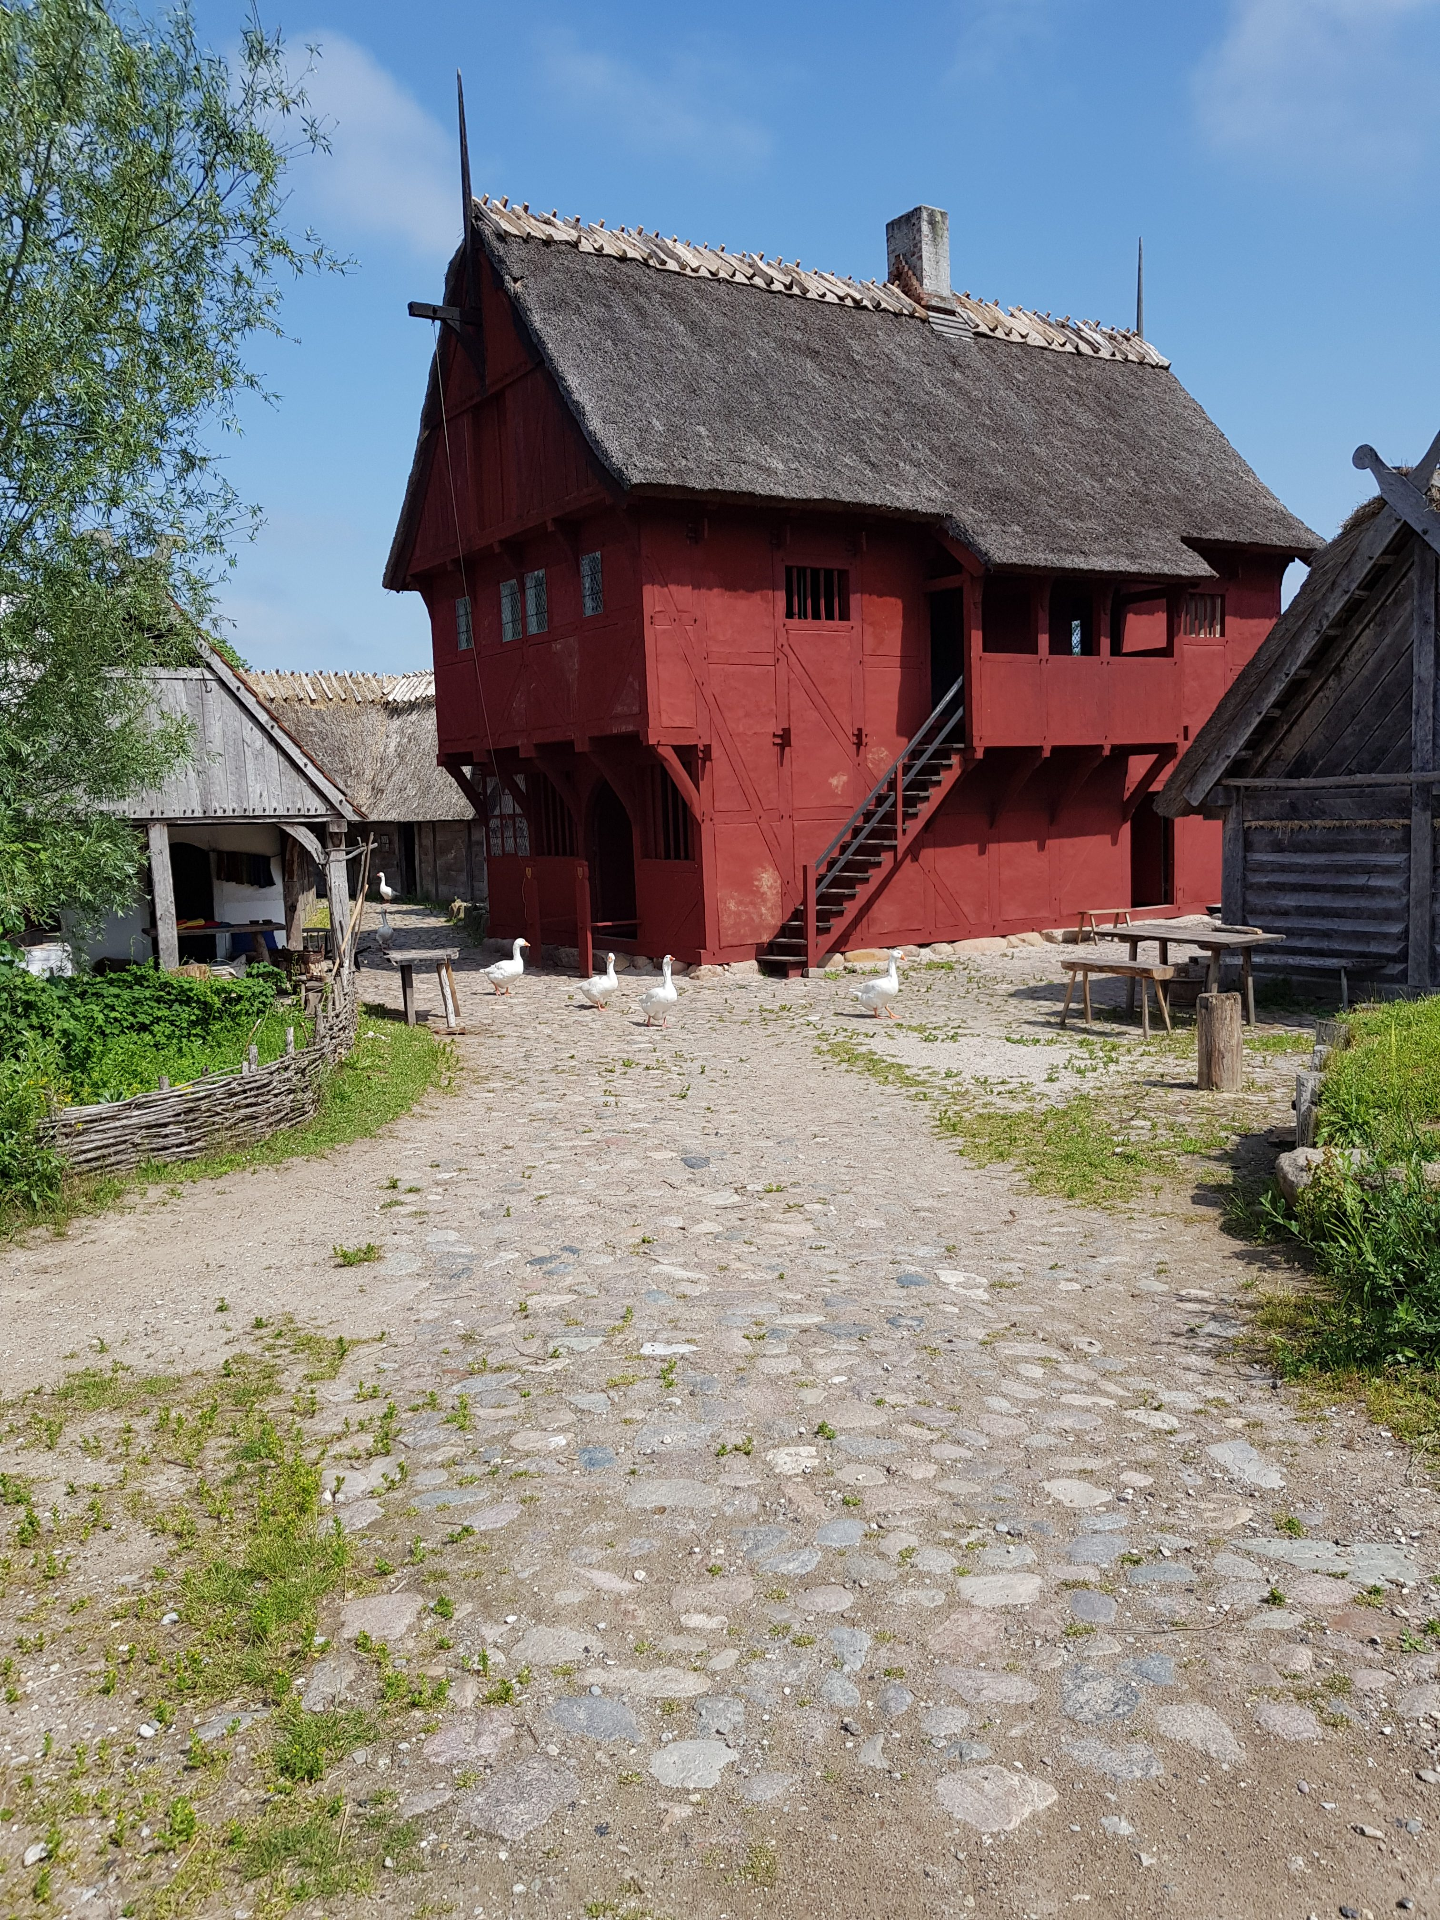 Mittelalter auf Falster © Pfotentour